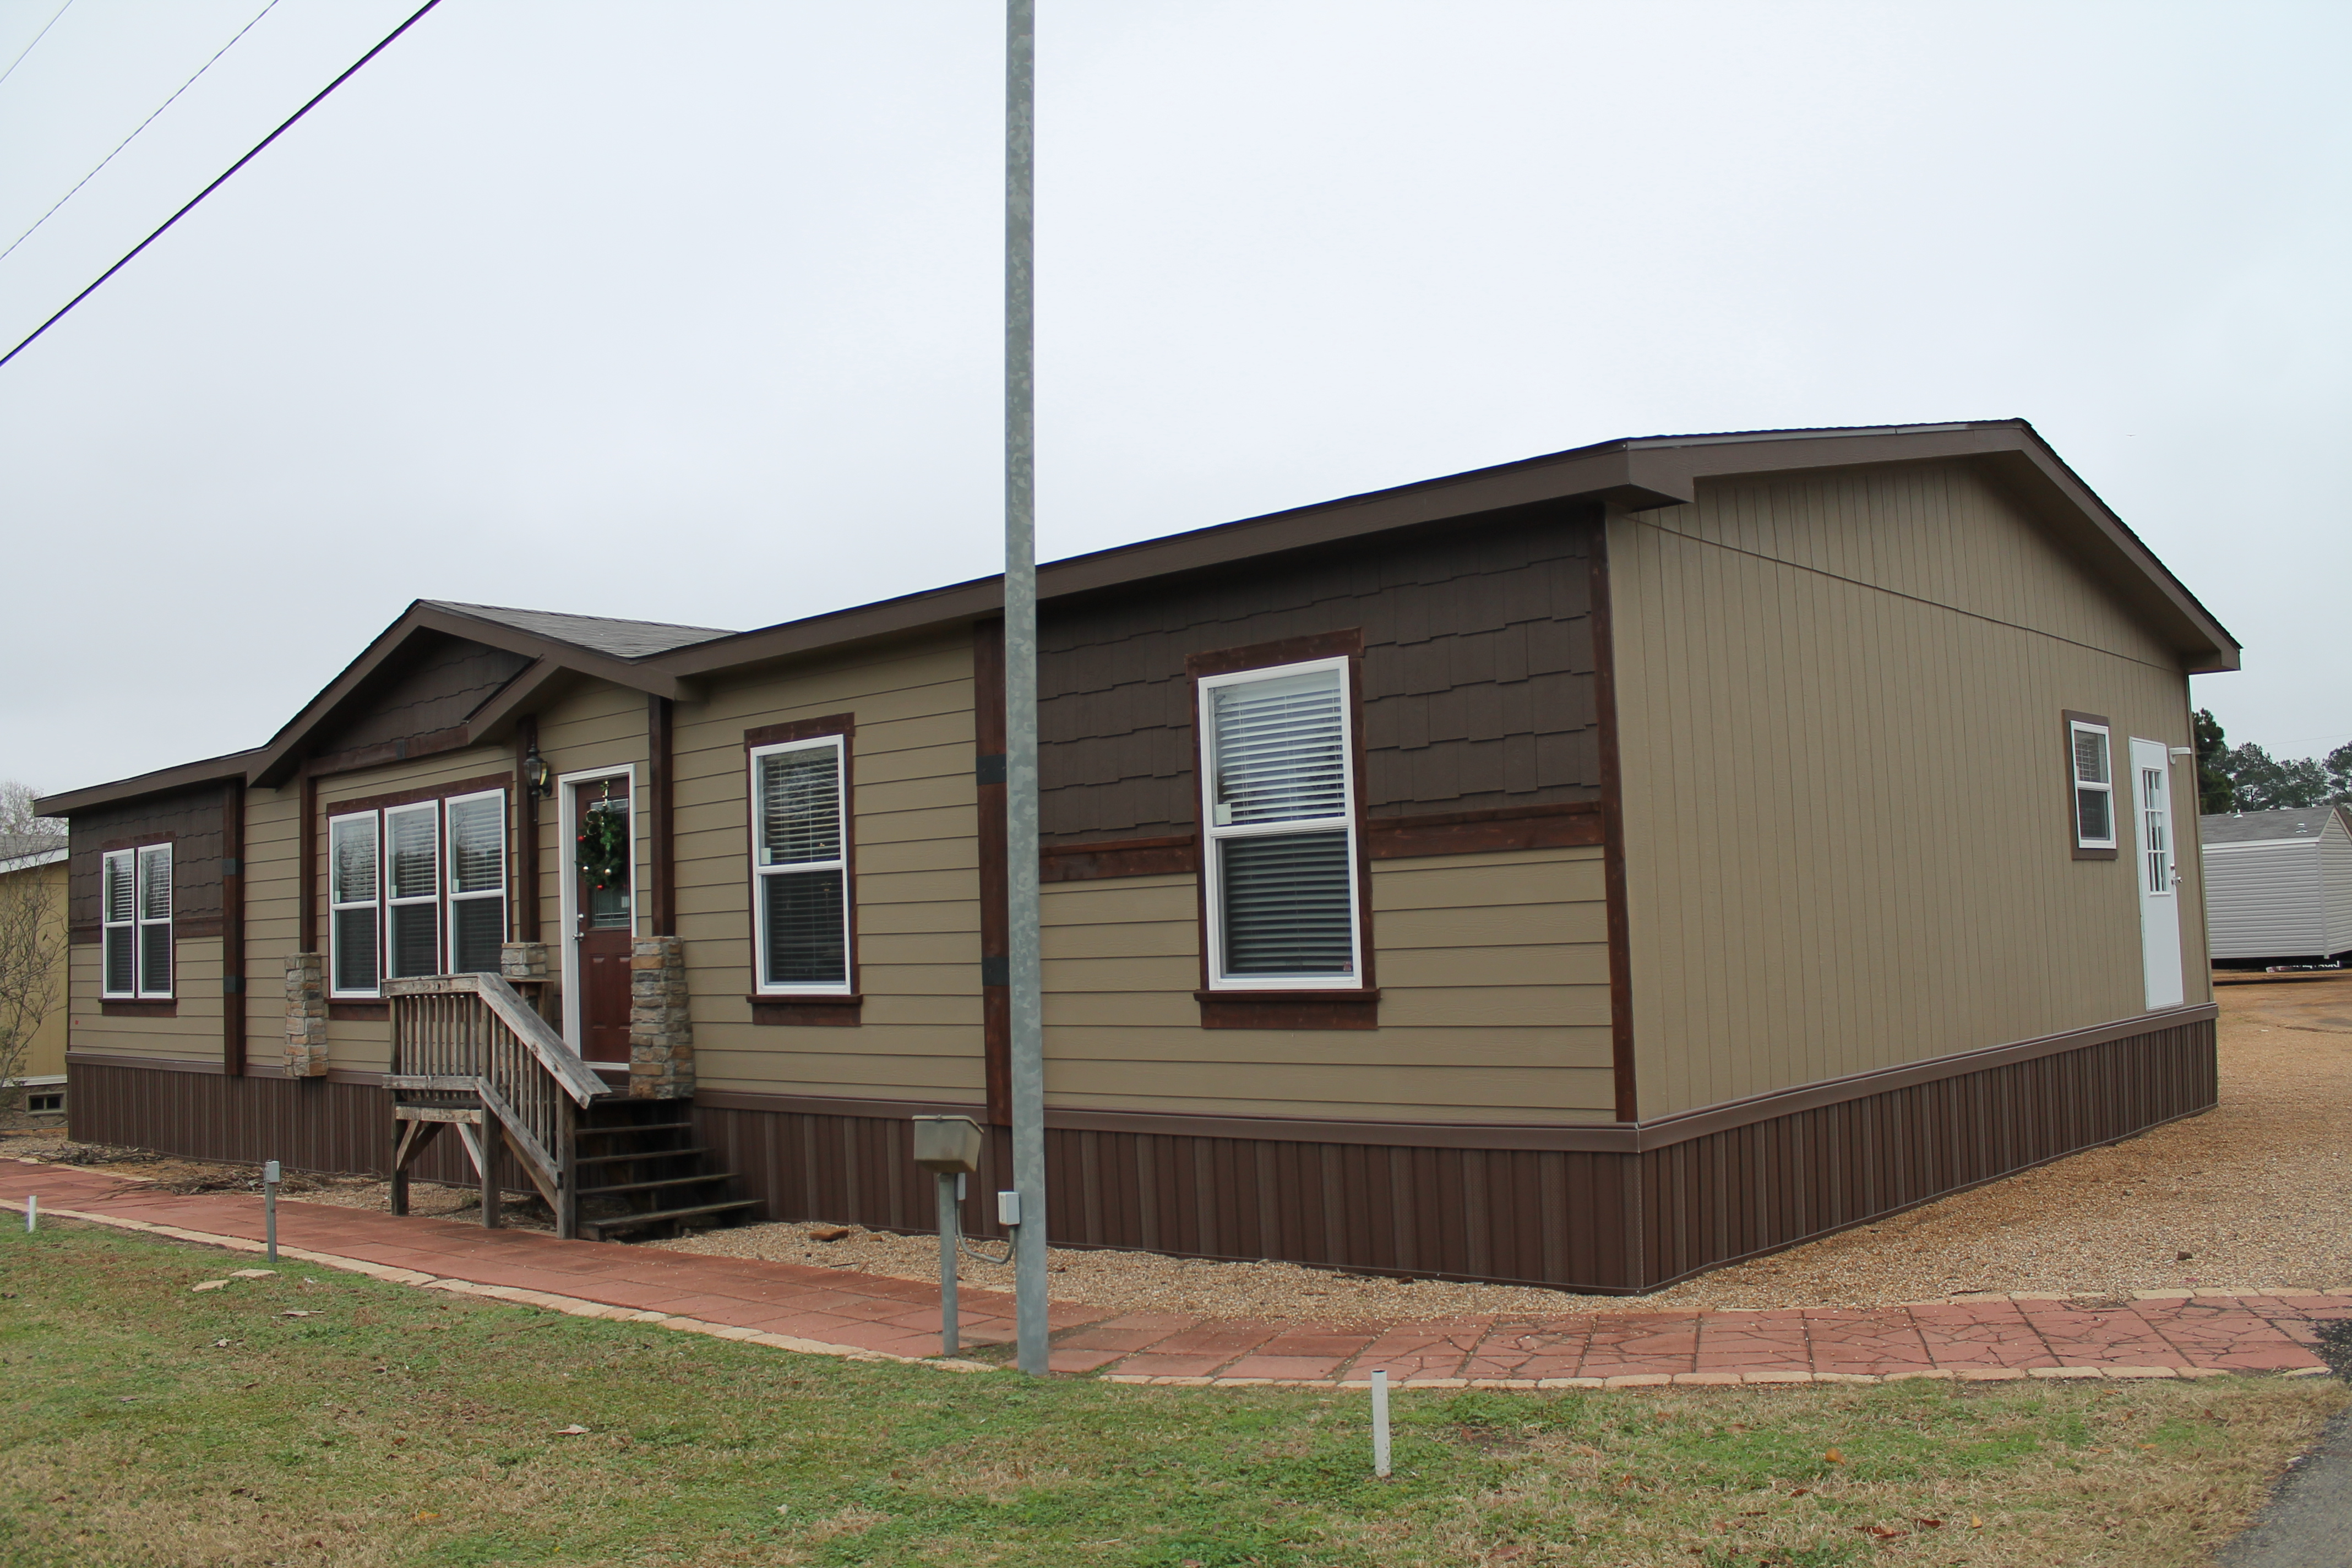 freedom homes in lufkin tx 75901